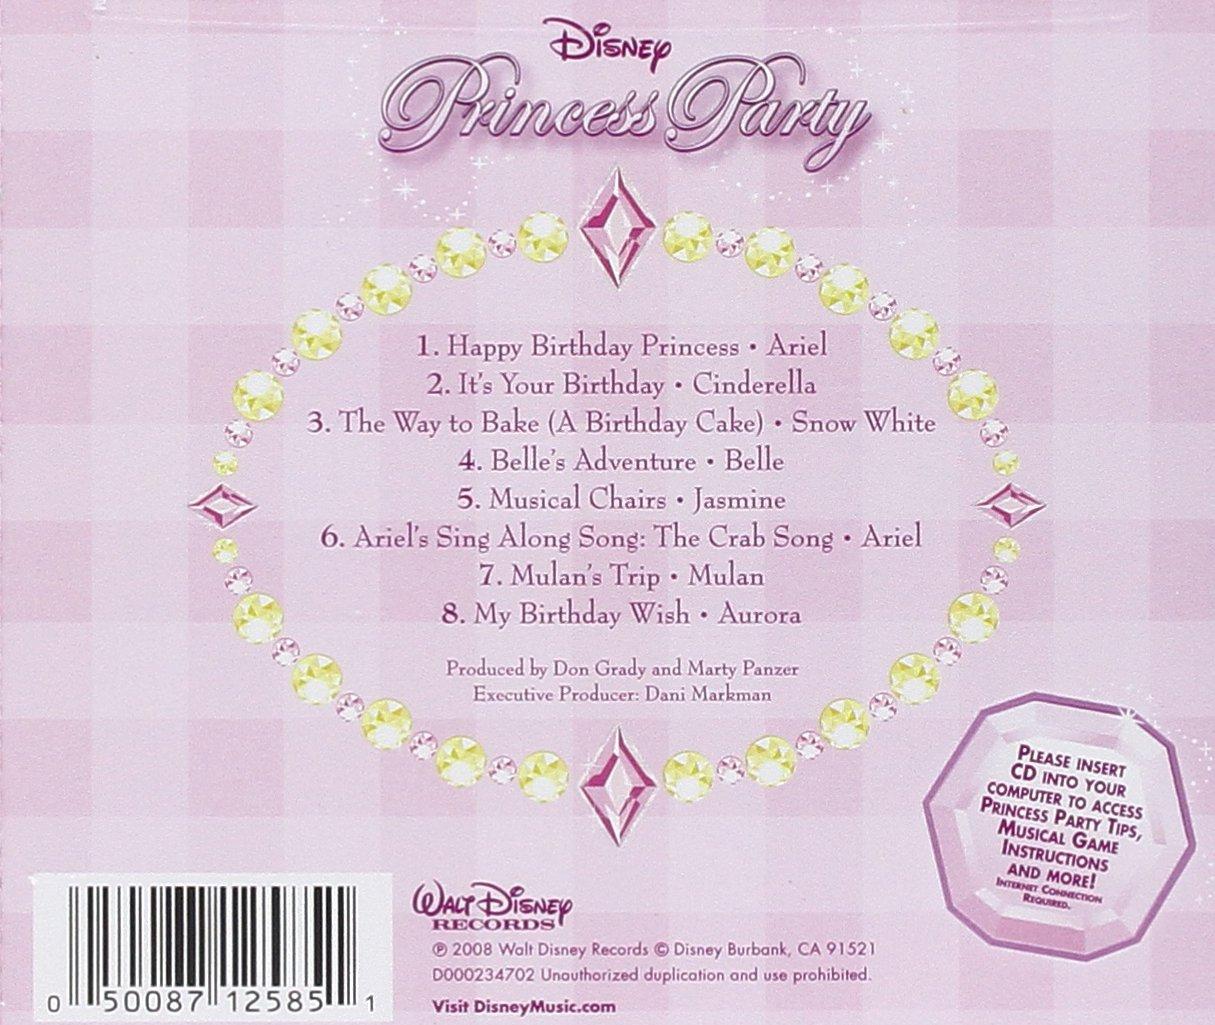 Disney - Disney Princess Party - Amazon.com Music